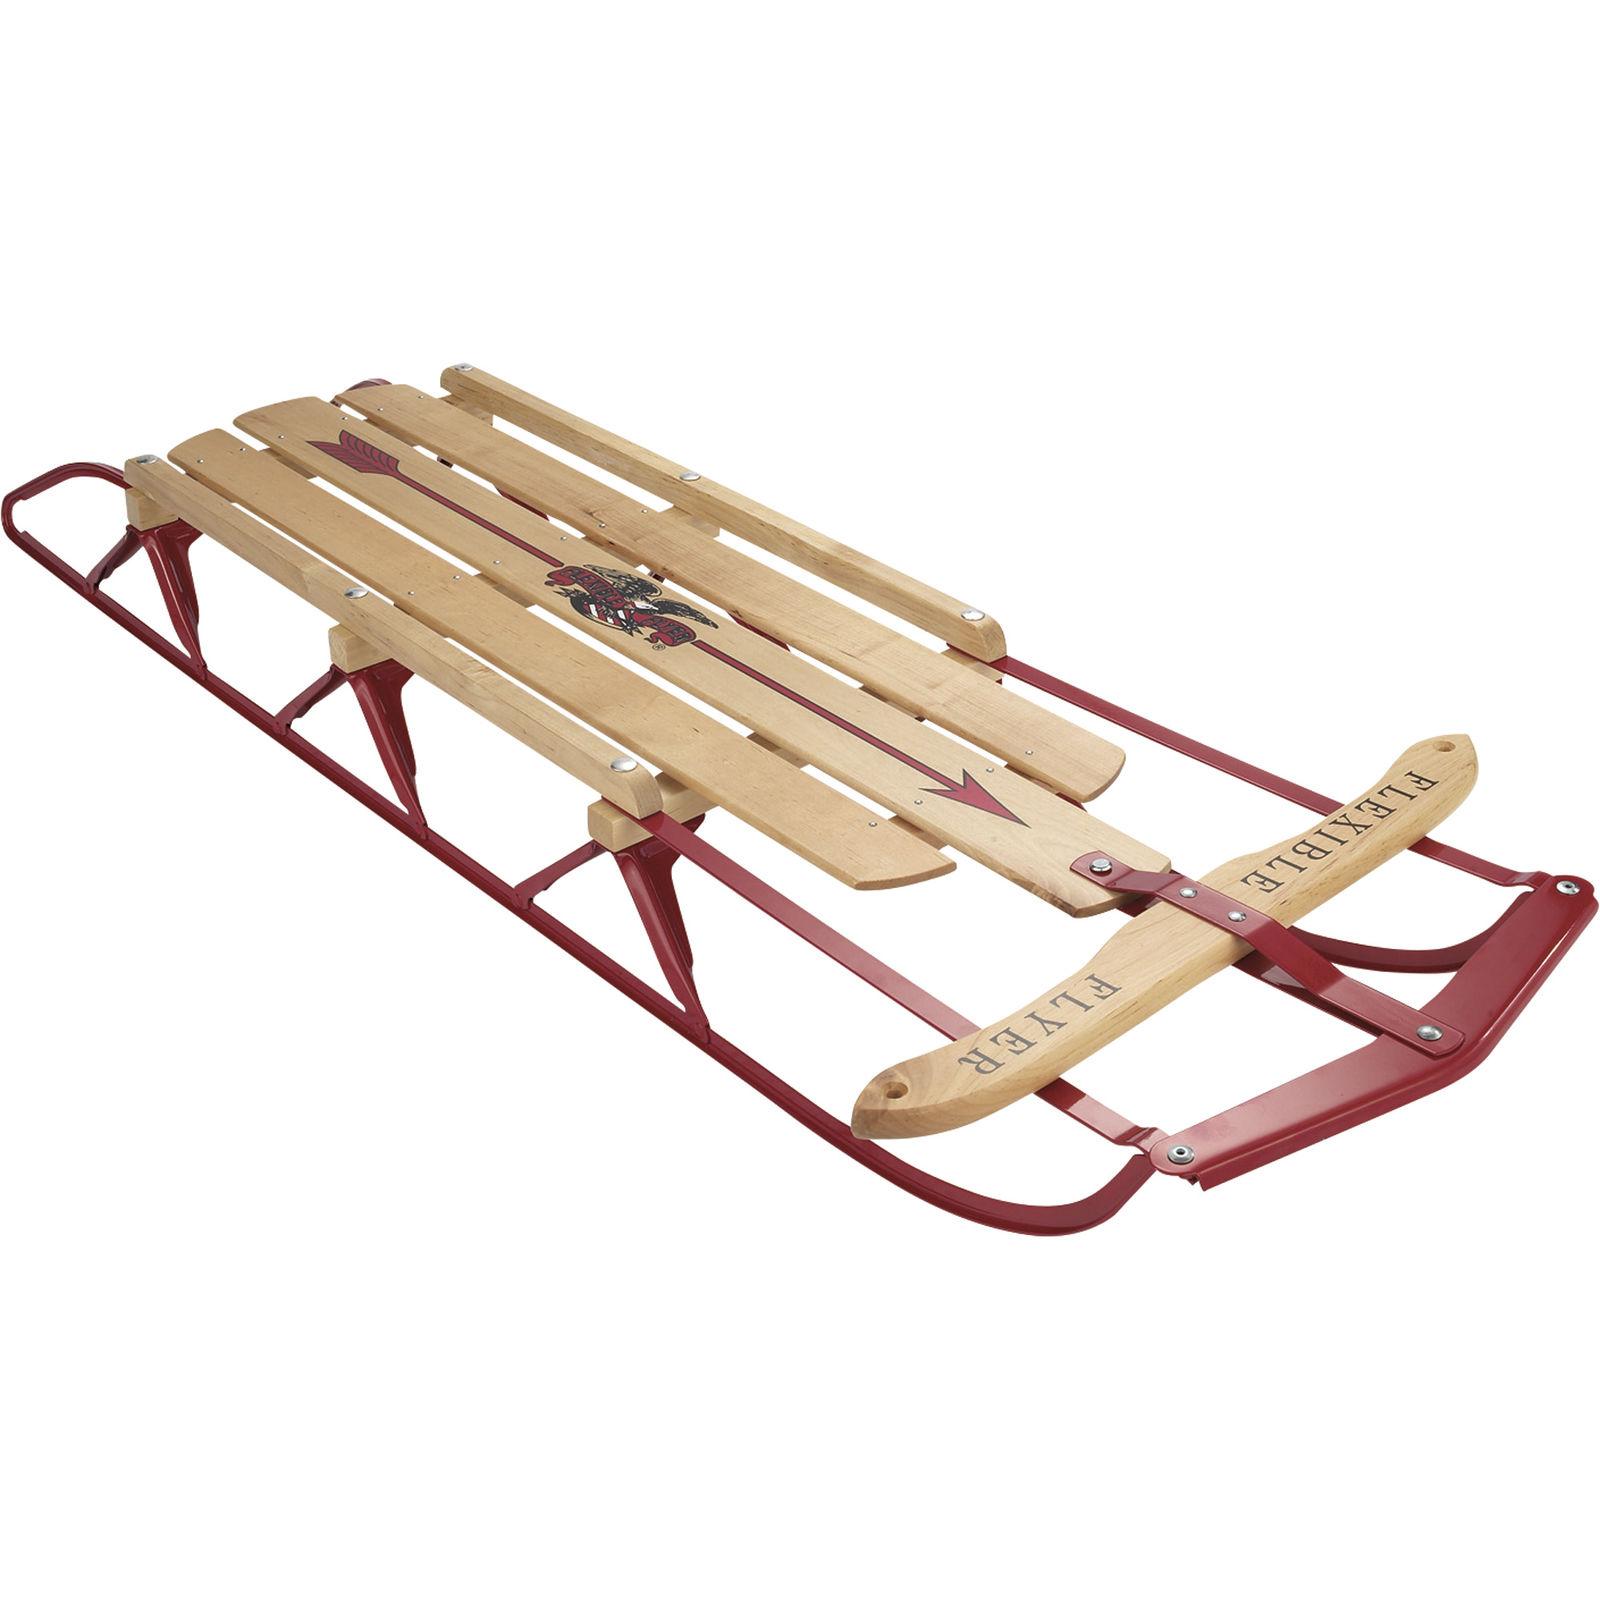 1600x1600 Paricon Flexible Flyer Steel Runner 54 Inch Sled Wood Ebay